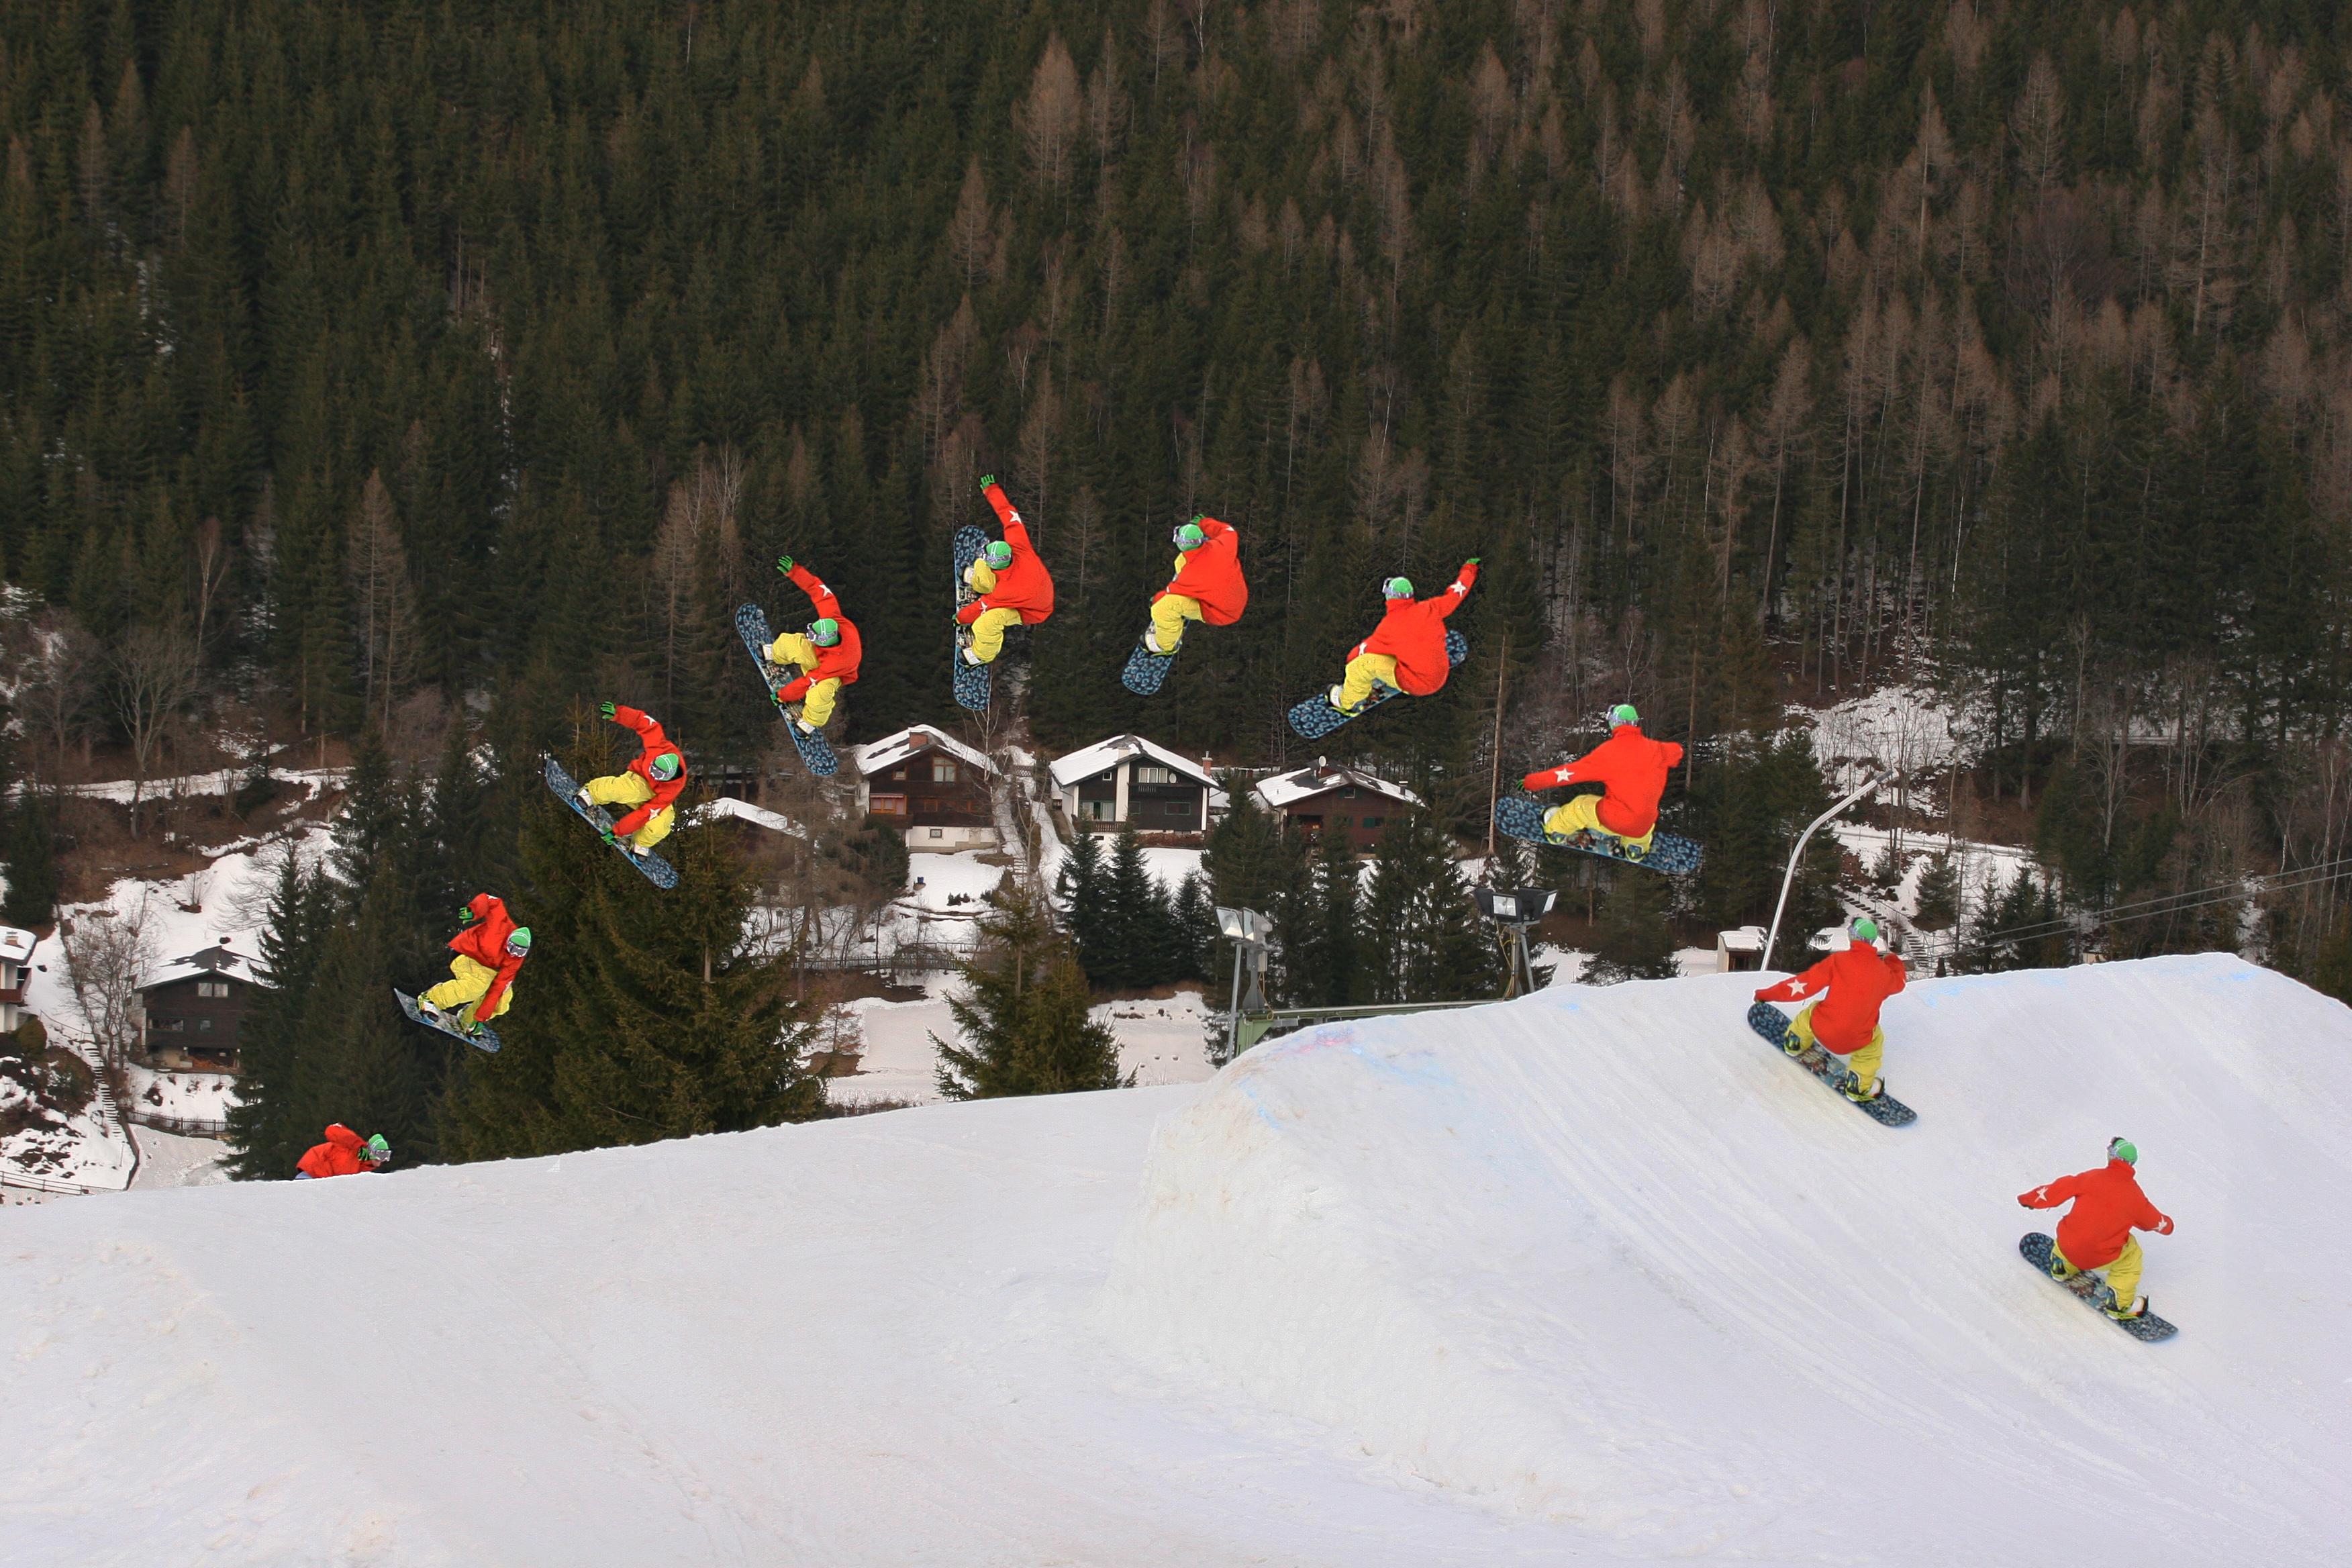 Snowboard fs indy 3